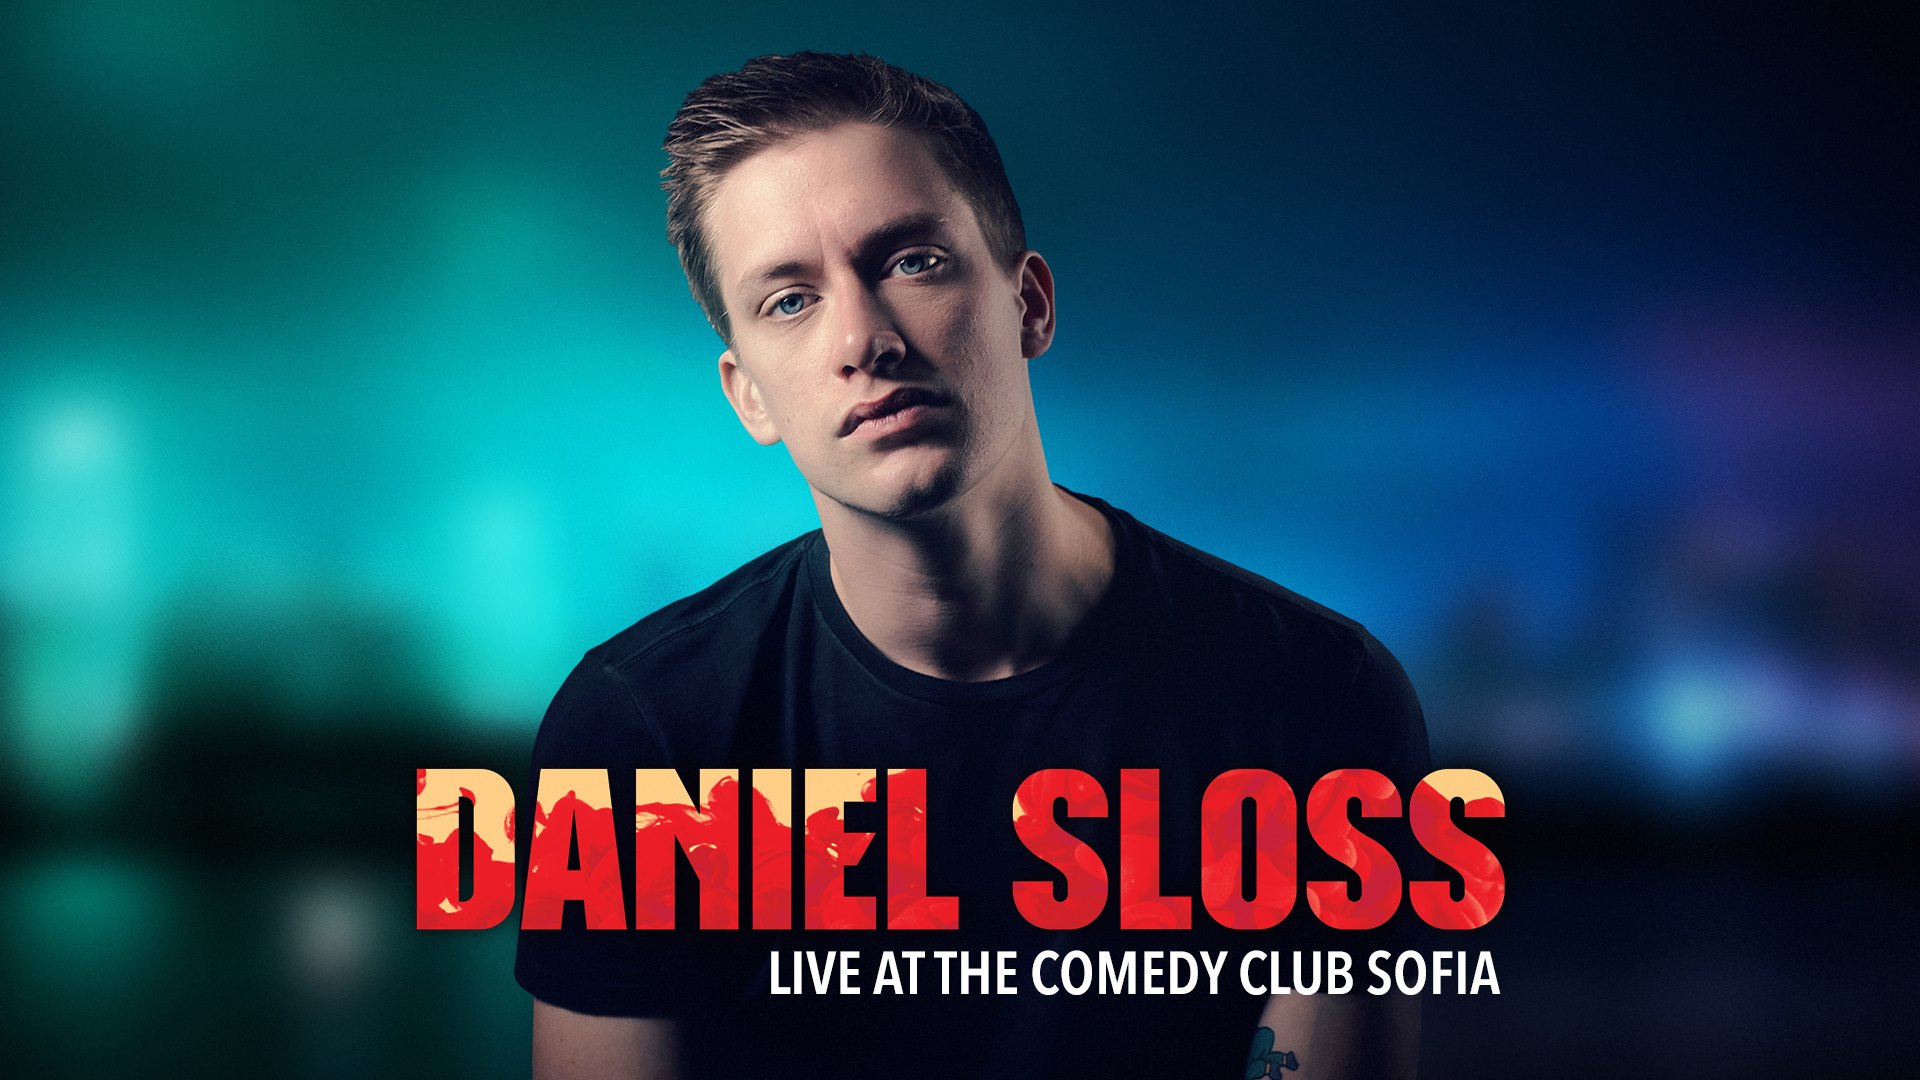 stand up comedy daniel sloss english comedy sofia